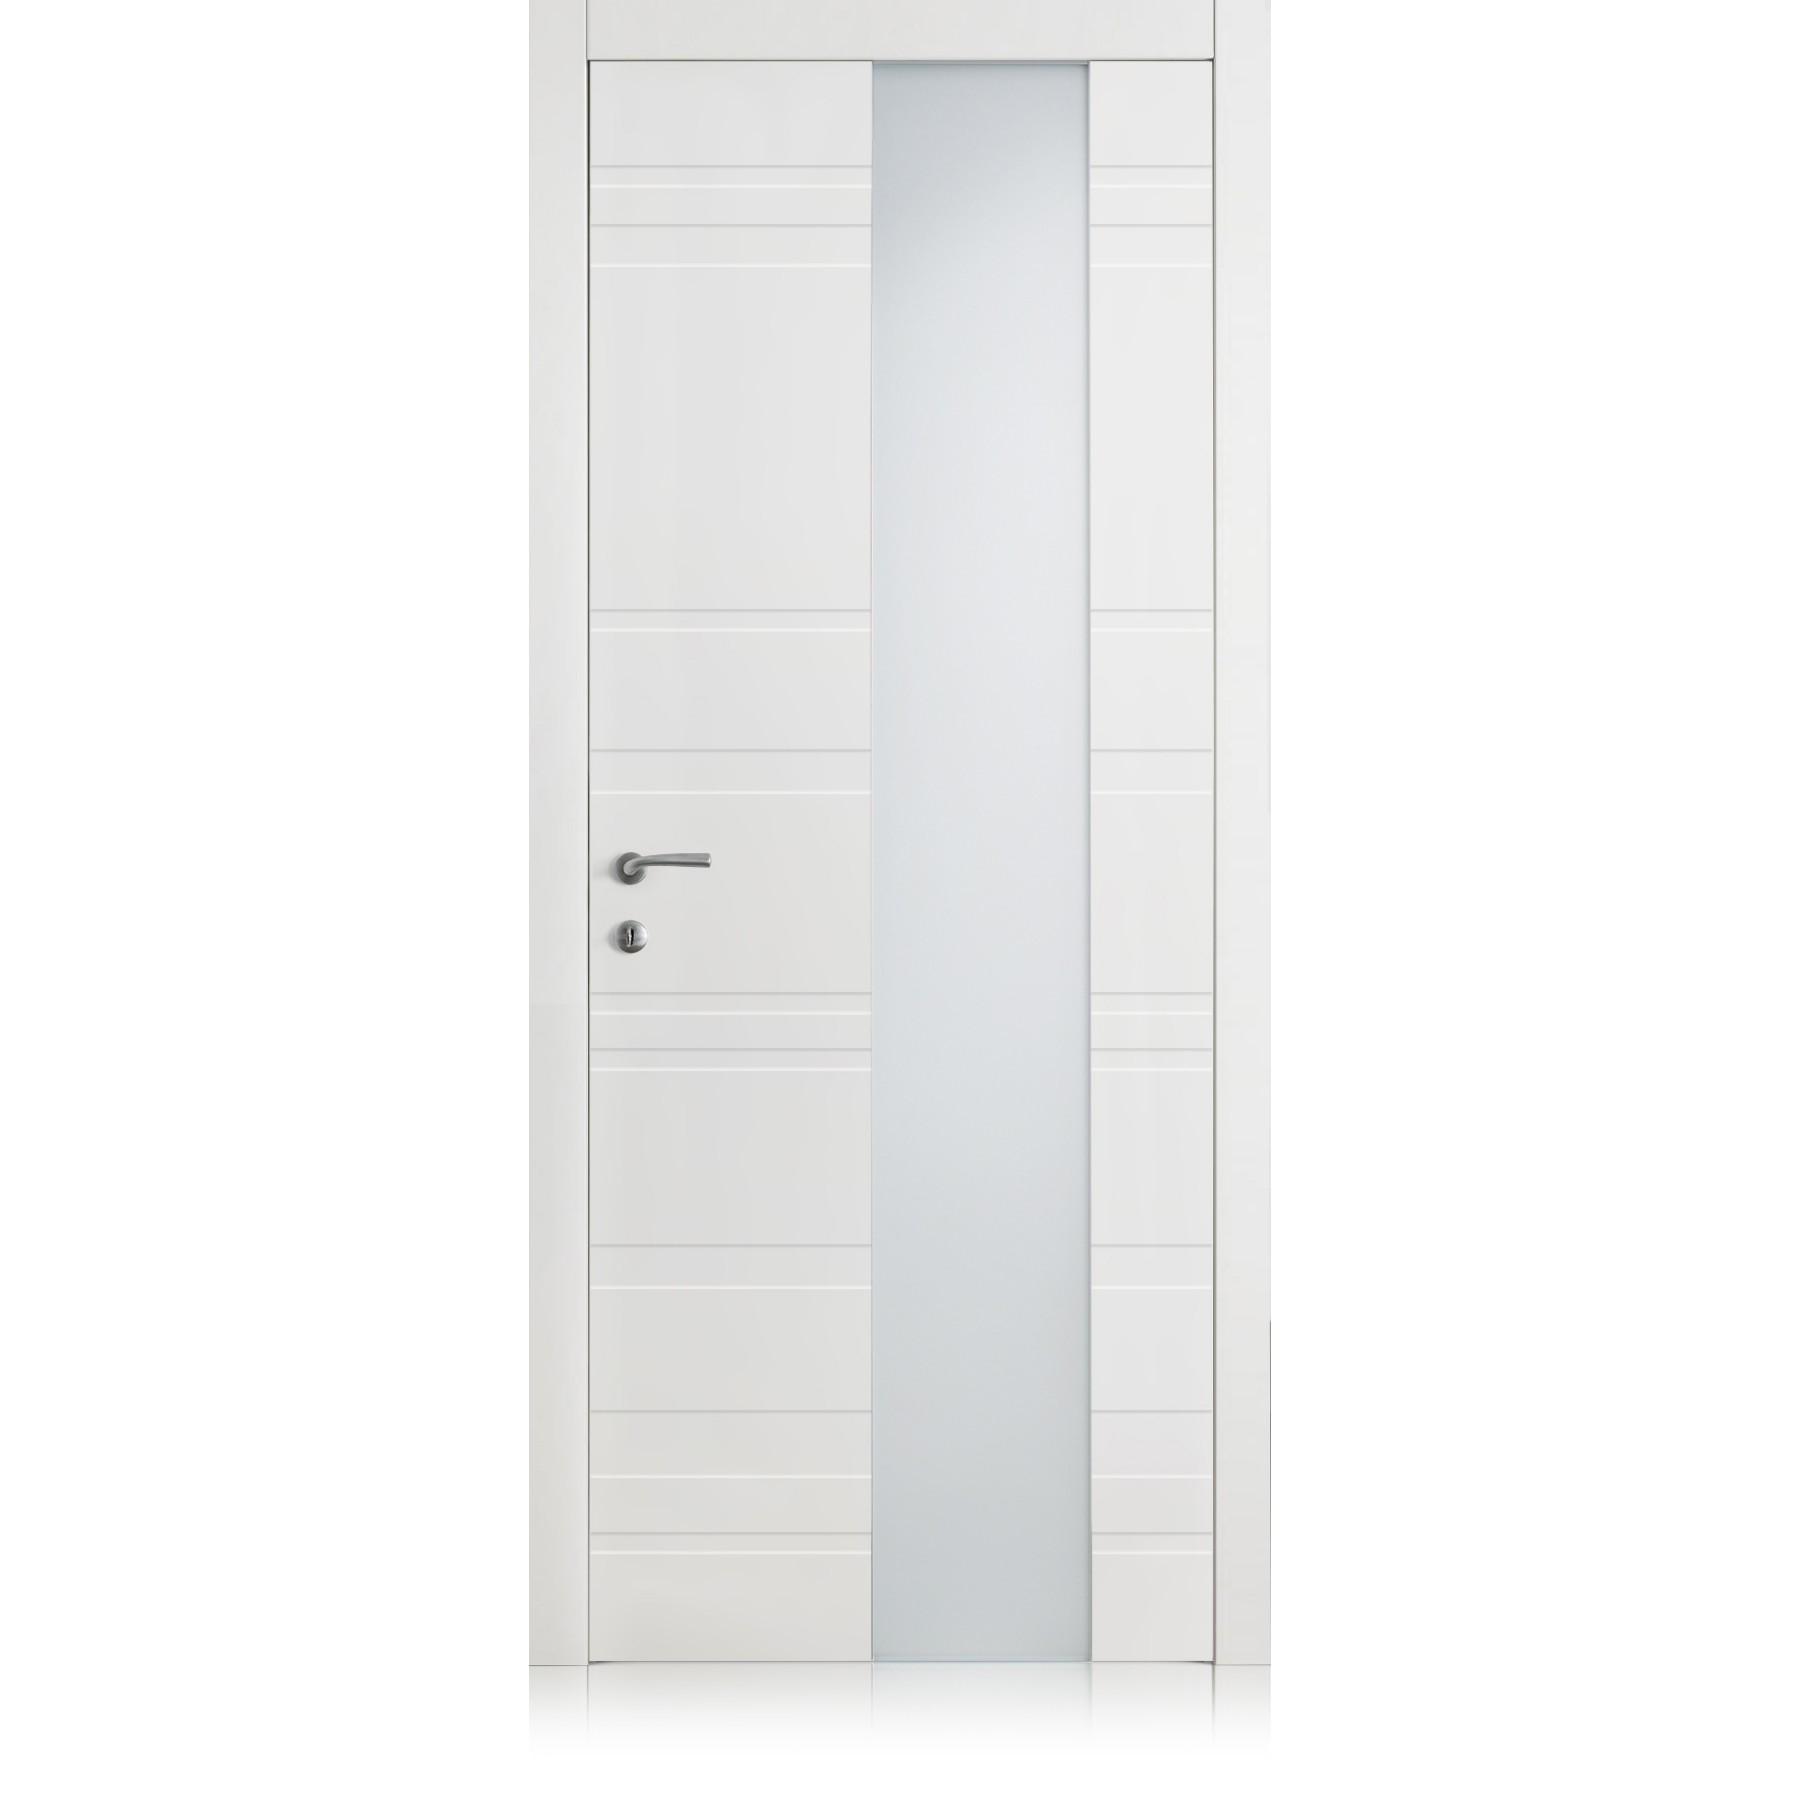 Yncisa Styla Vetro Bianco Laccato ULTRAopaco door